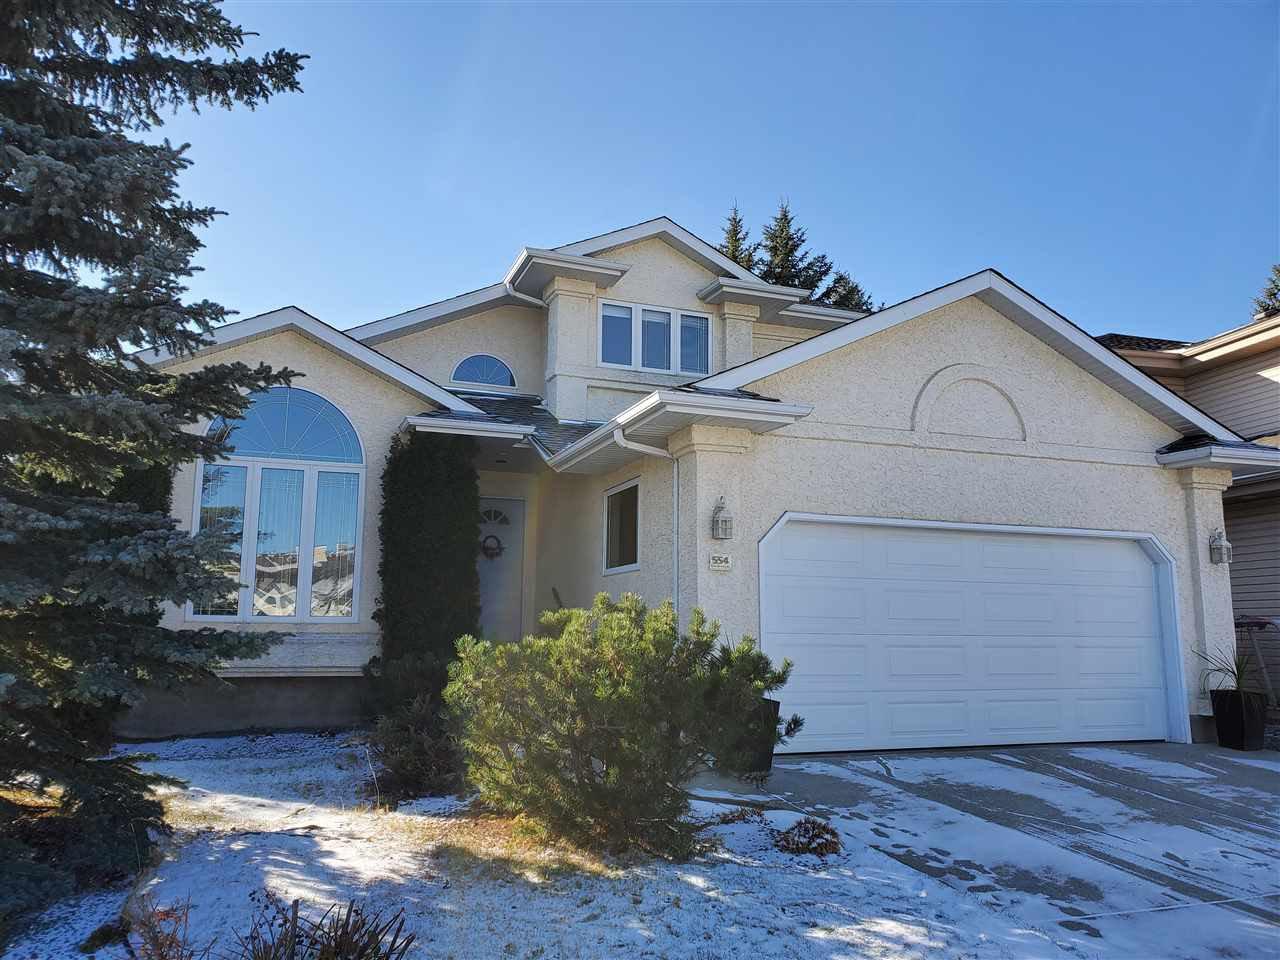 Main Photo: 554 Twin Brooks Bay in Edmonton: Zone 16 House for sale : MLS®# E4174613